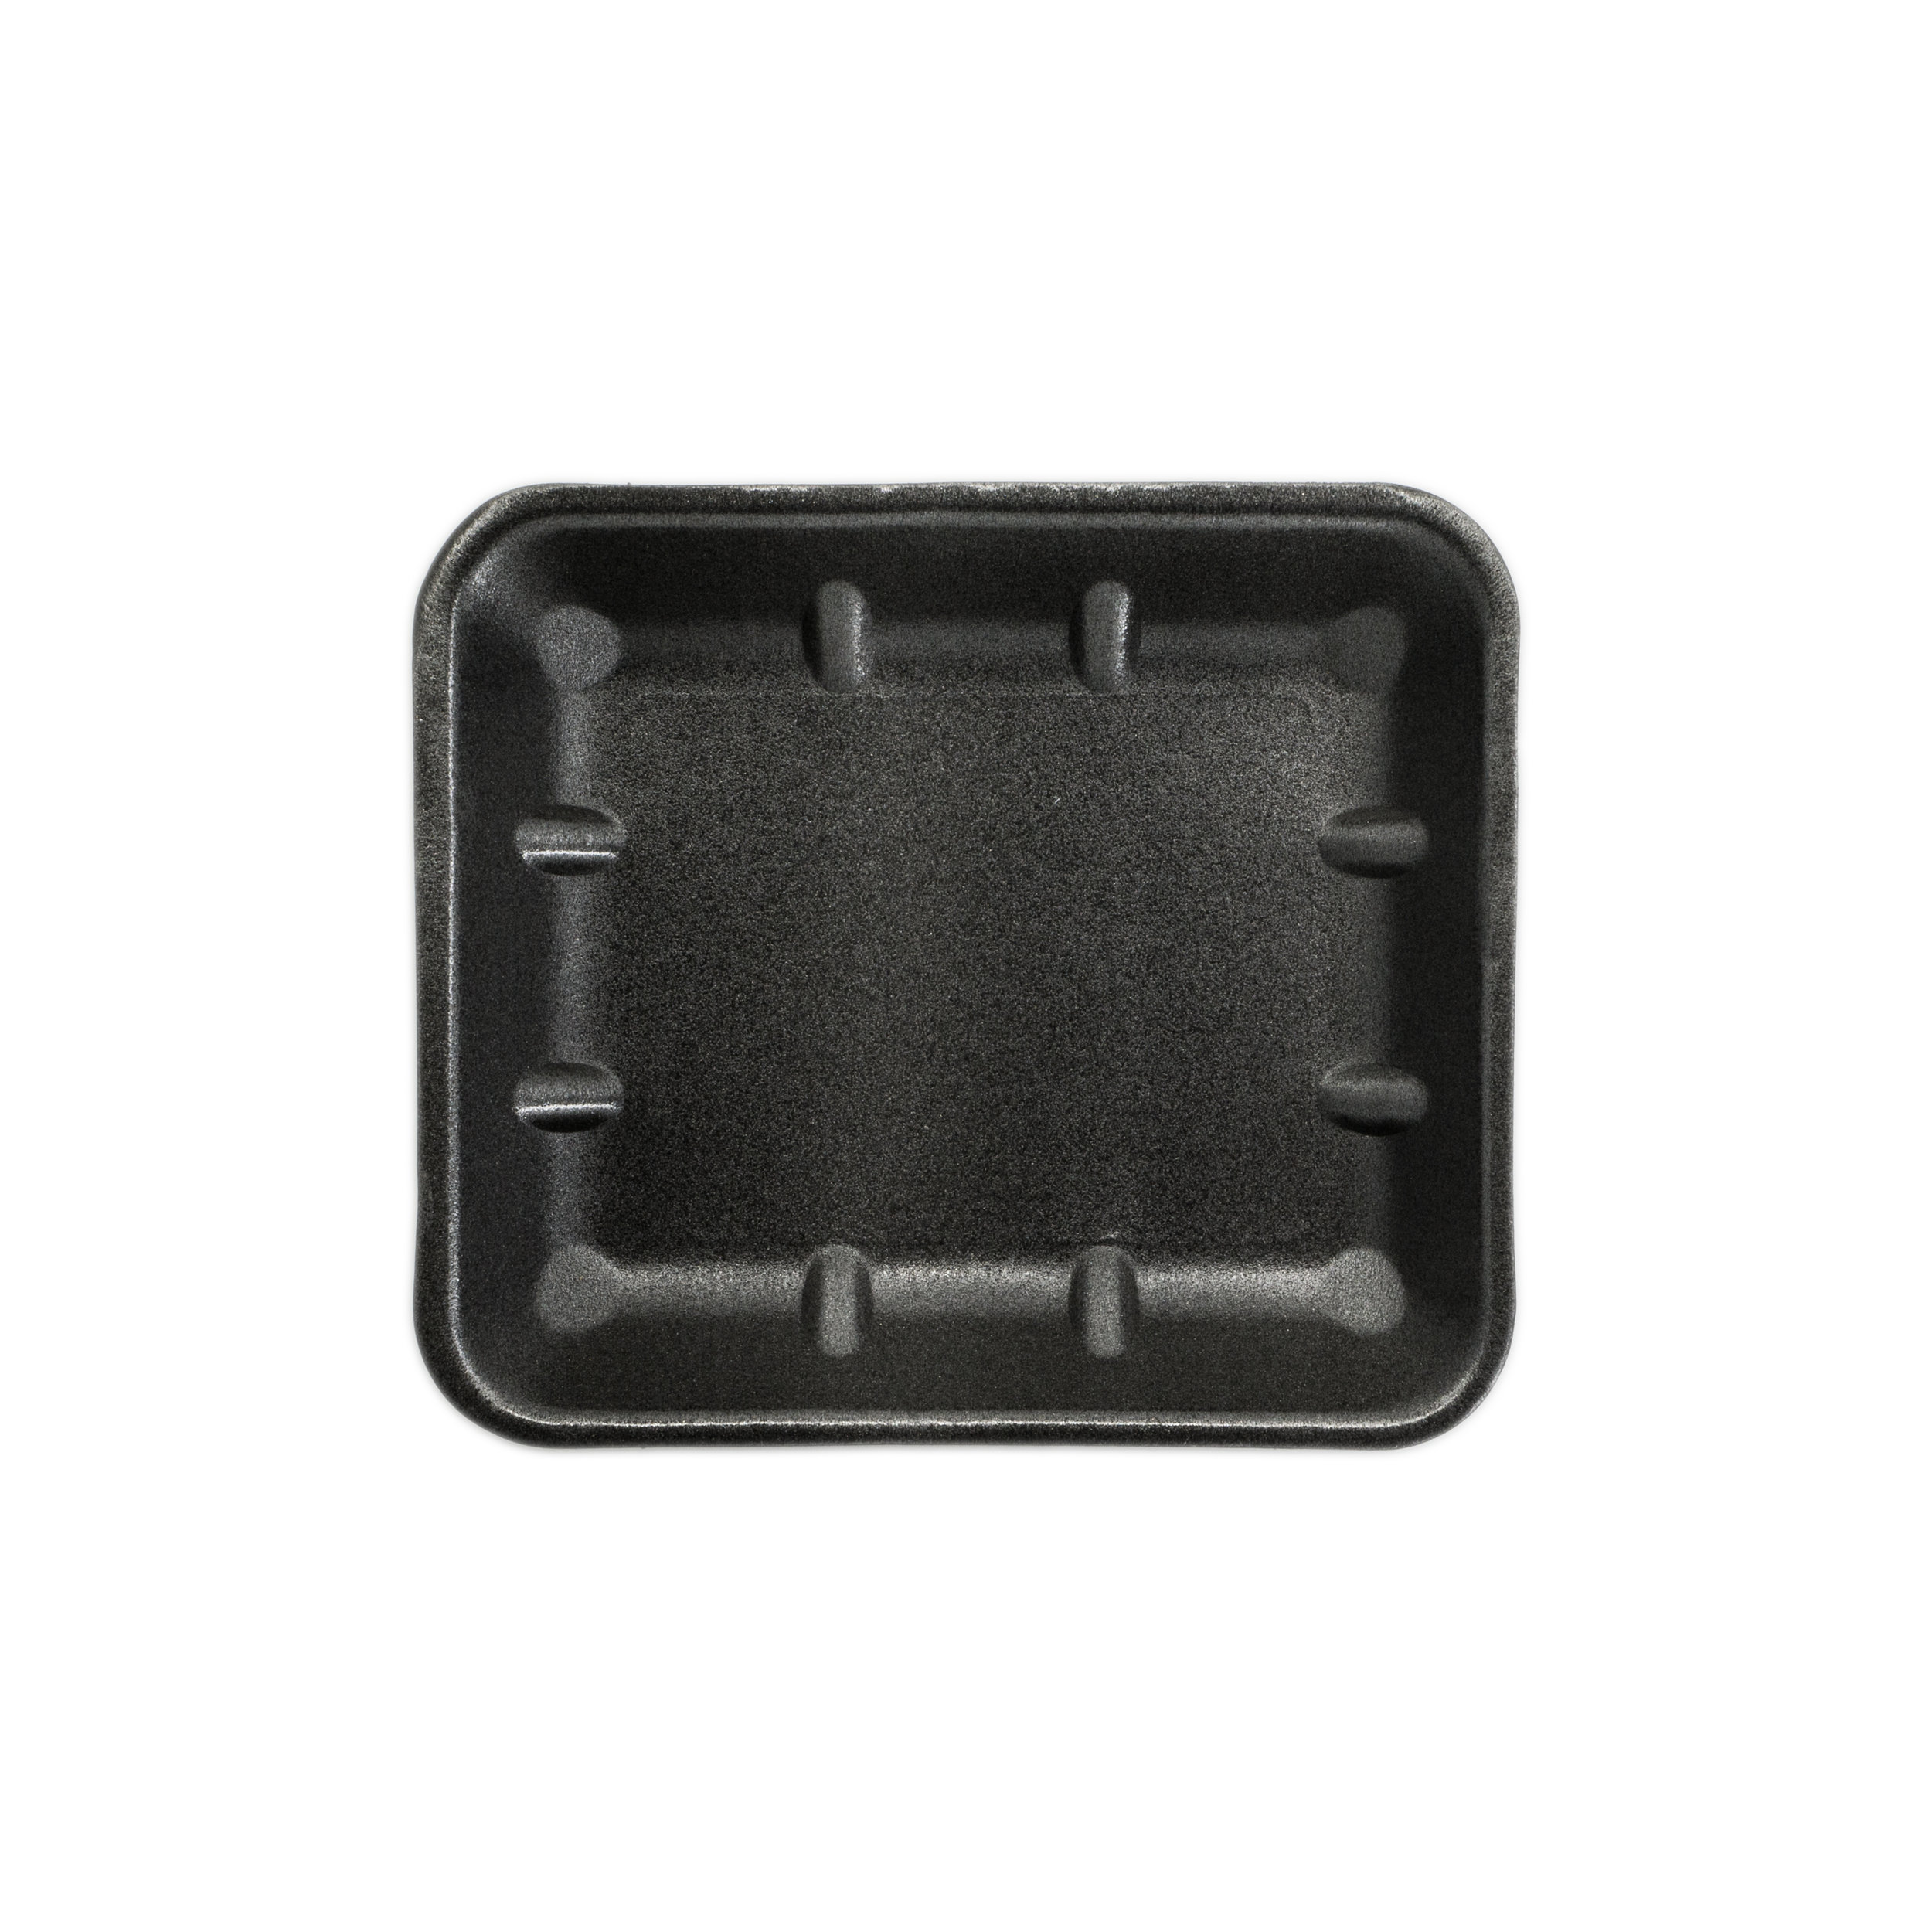 iK0221 CLOSED CELL D  EEP 8x7   90 per sleeve 360 per carton